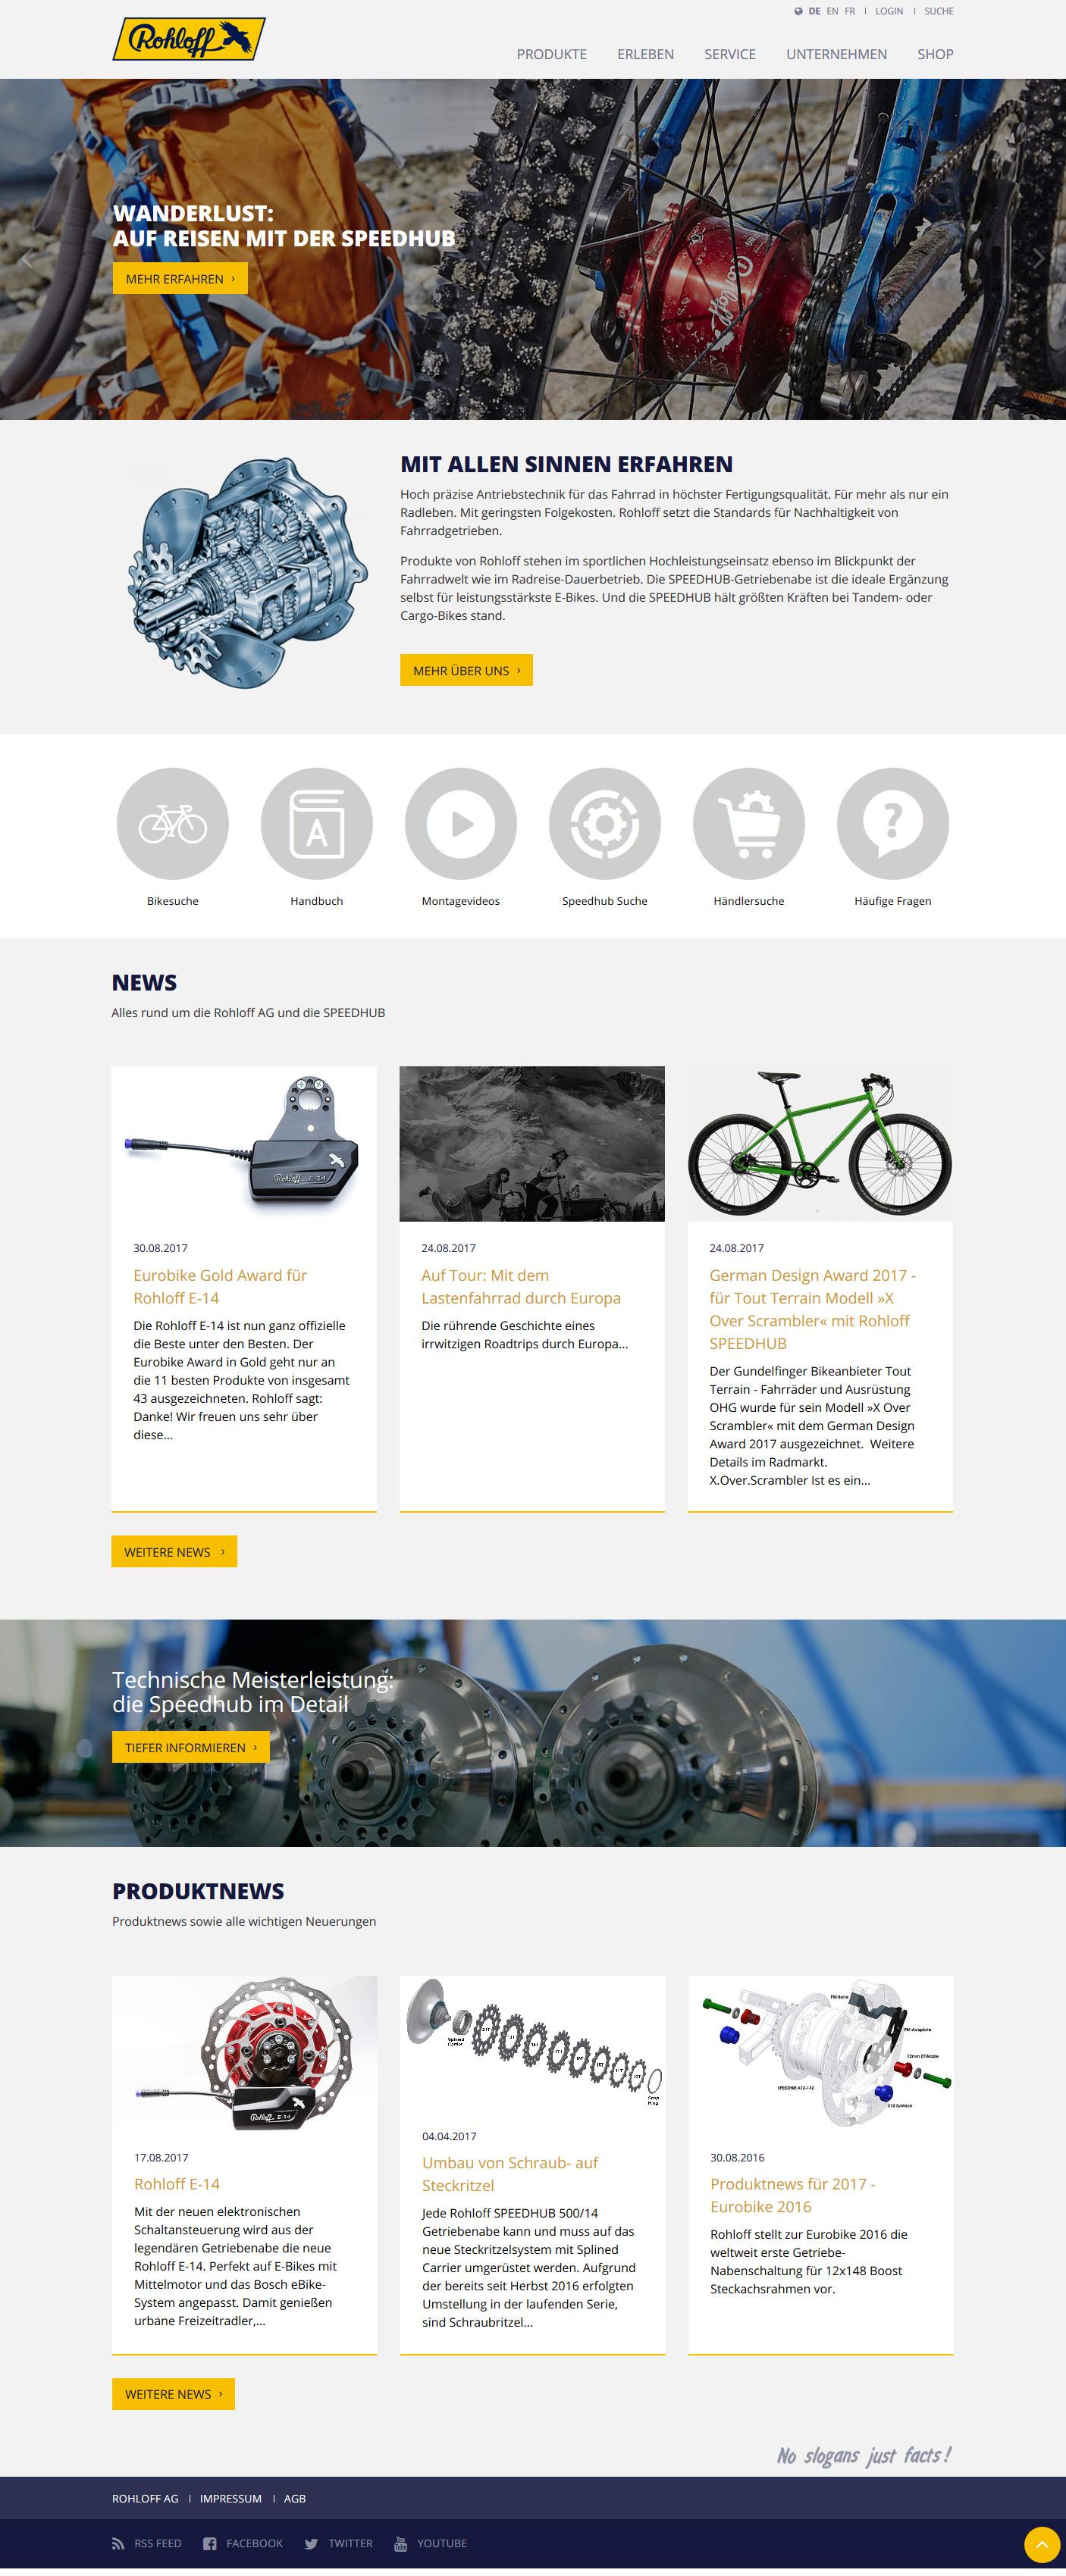 Screenshot der umgesetzten Startseite (Abruf am 4. September 2017)